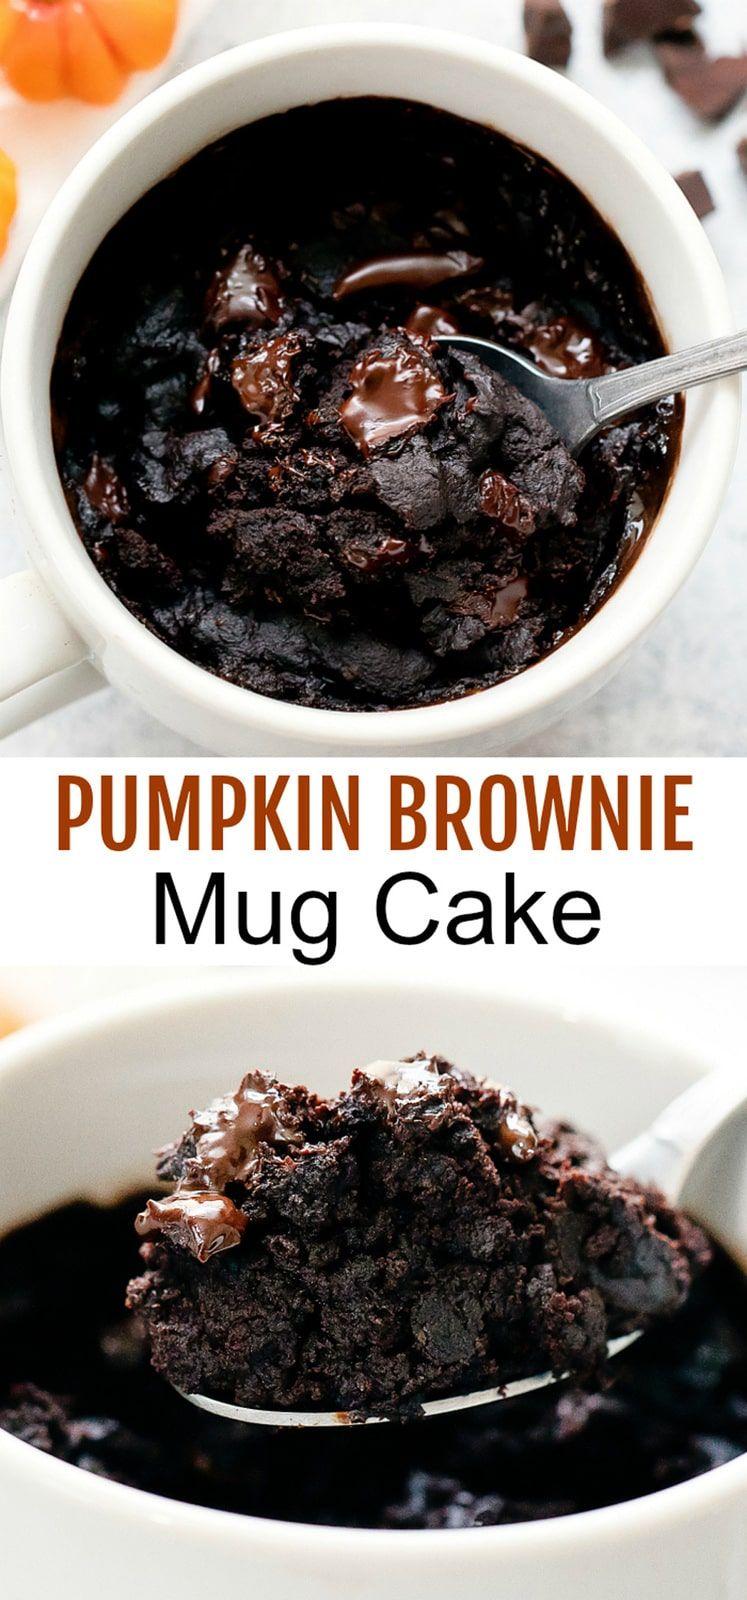 Pumpkin Brownie Mug Cake | Recipe | Pumpkin brownies, Mug ...